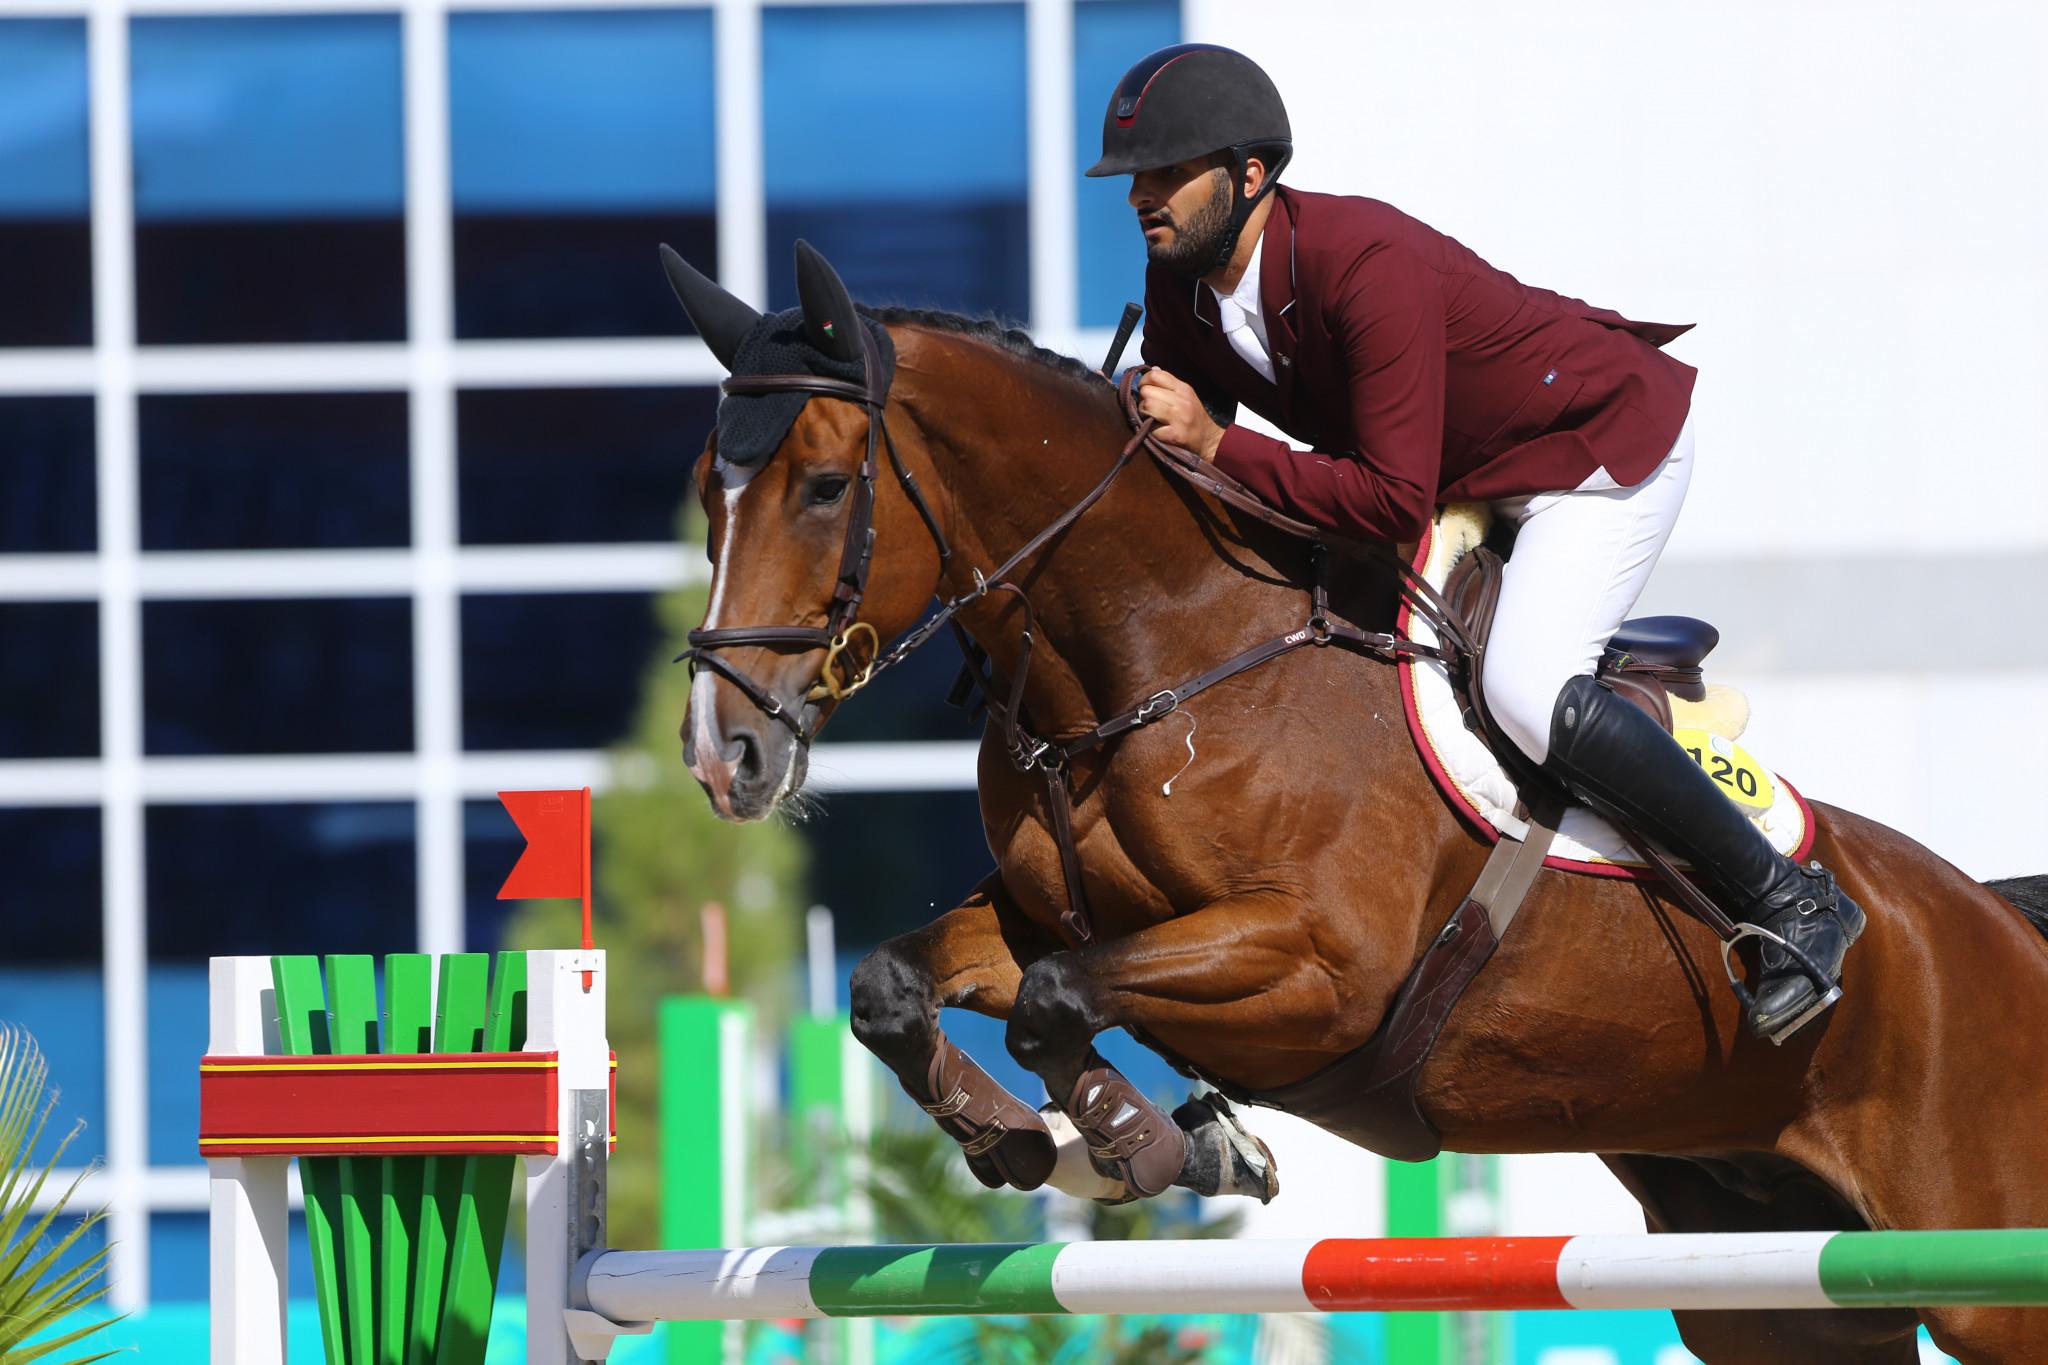 Qatar's Hamad Ali M A Al Attiayah claimed the Ashgabat 2017 individual equestrian jumping title today ©Ashgabat 2017/Lazaros Koukorikos/LAUREL Photo Services